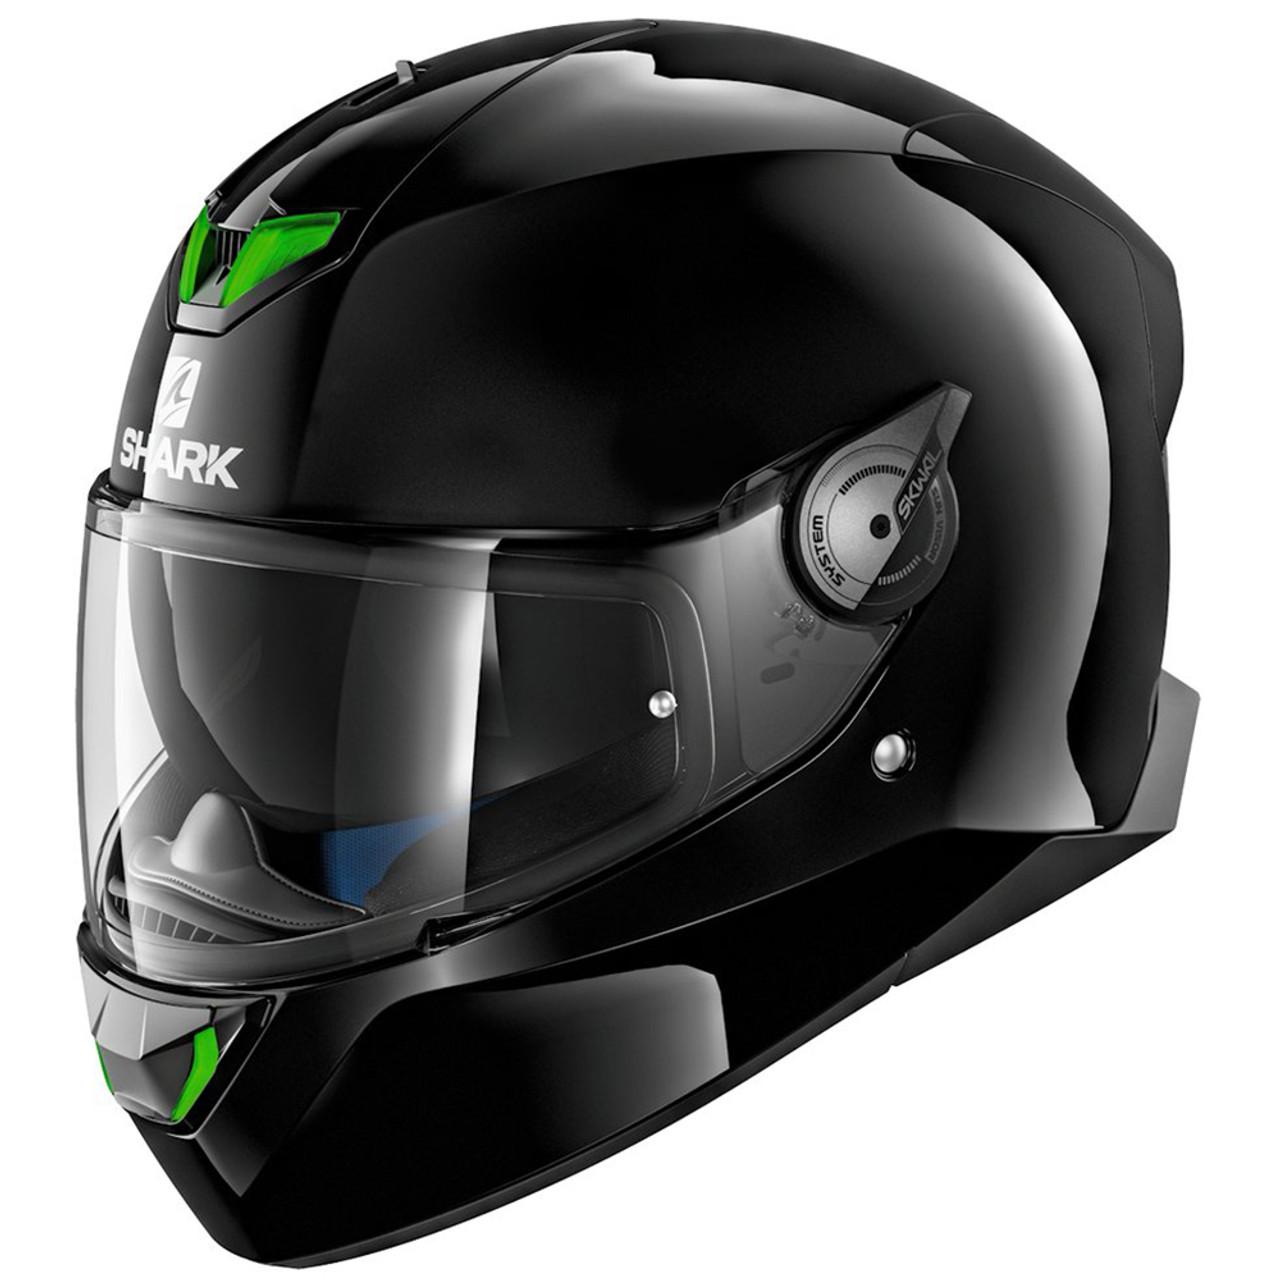 SHARK RIDILL BLANK Motorcycle Helmet Black Size S